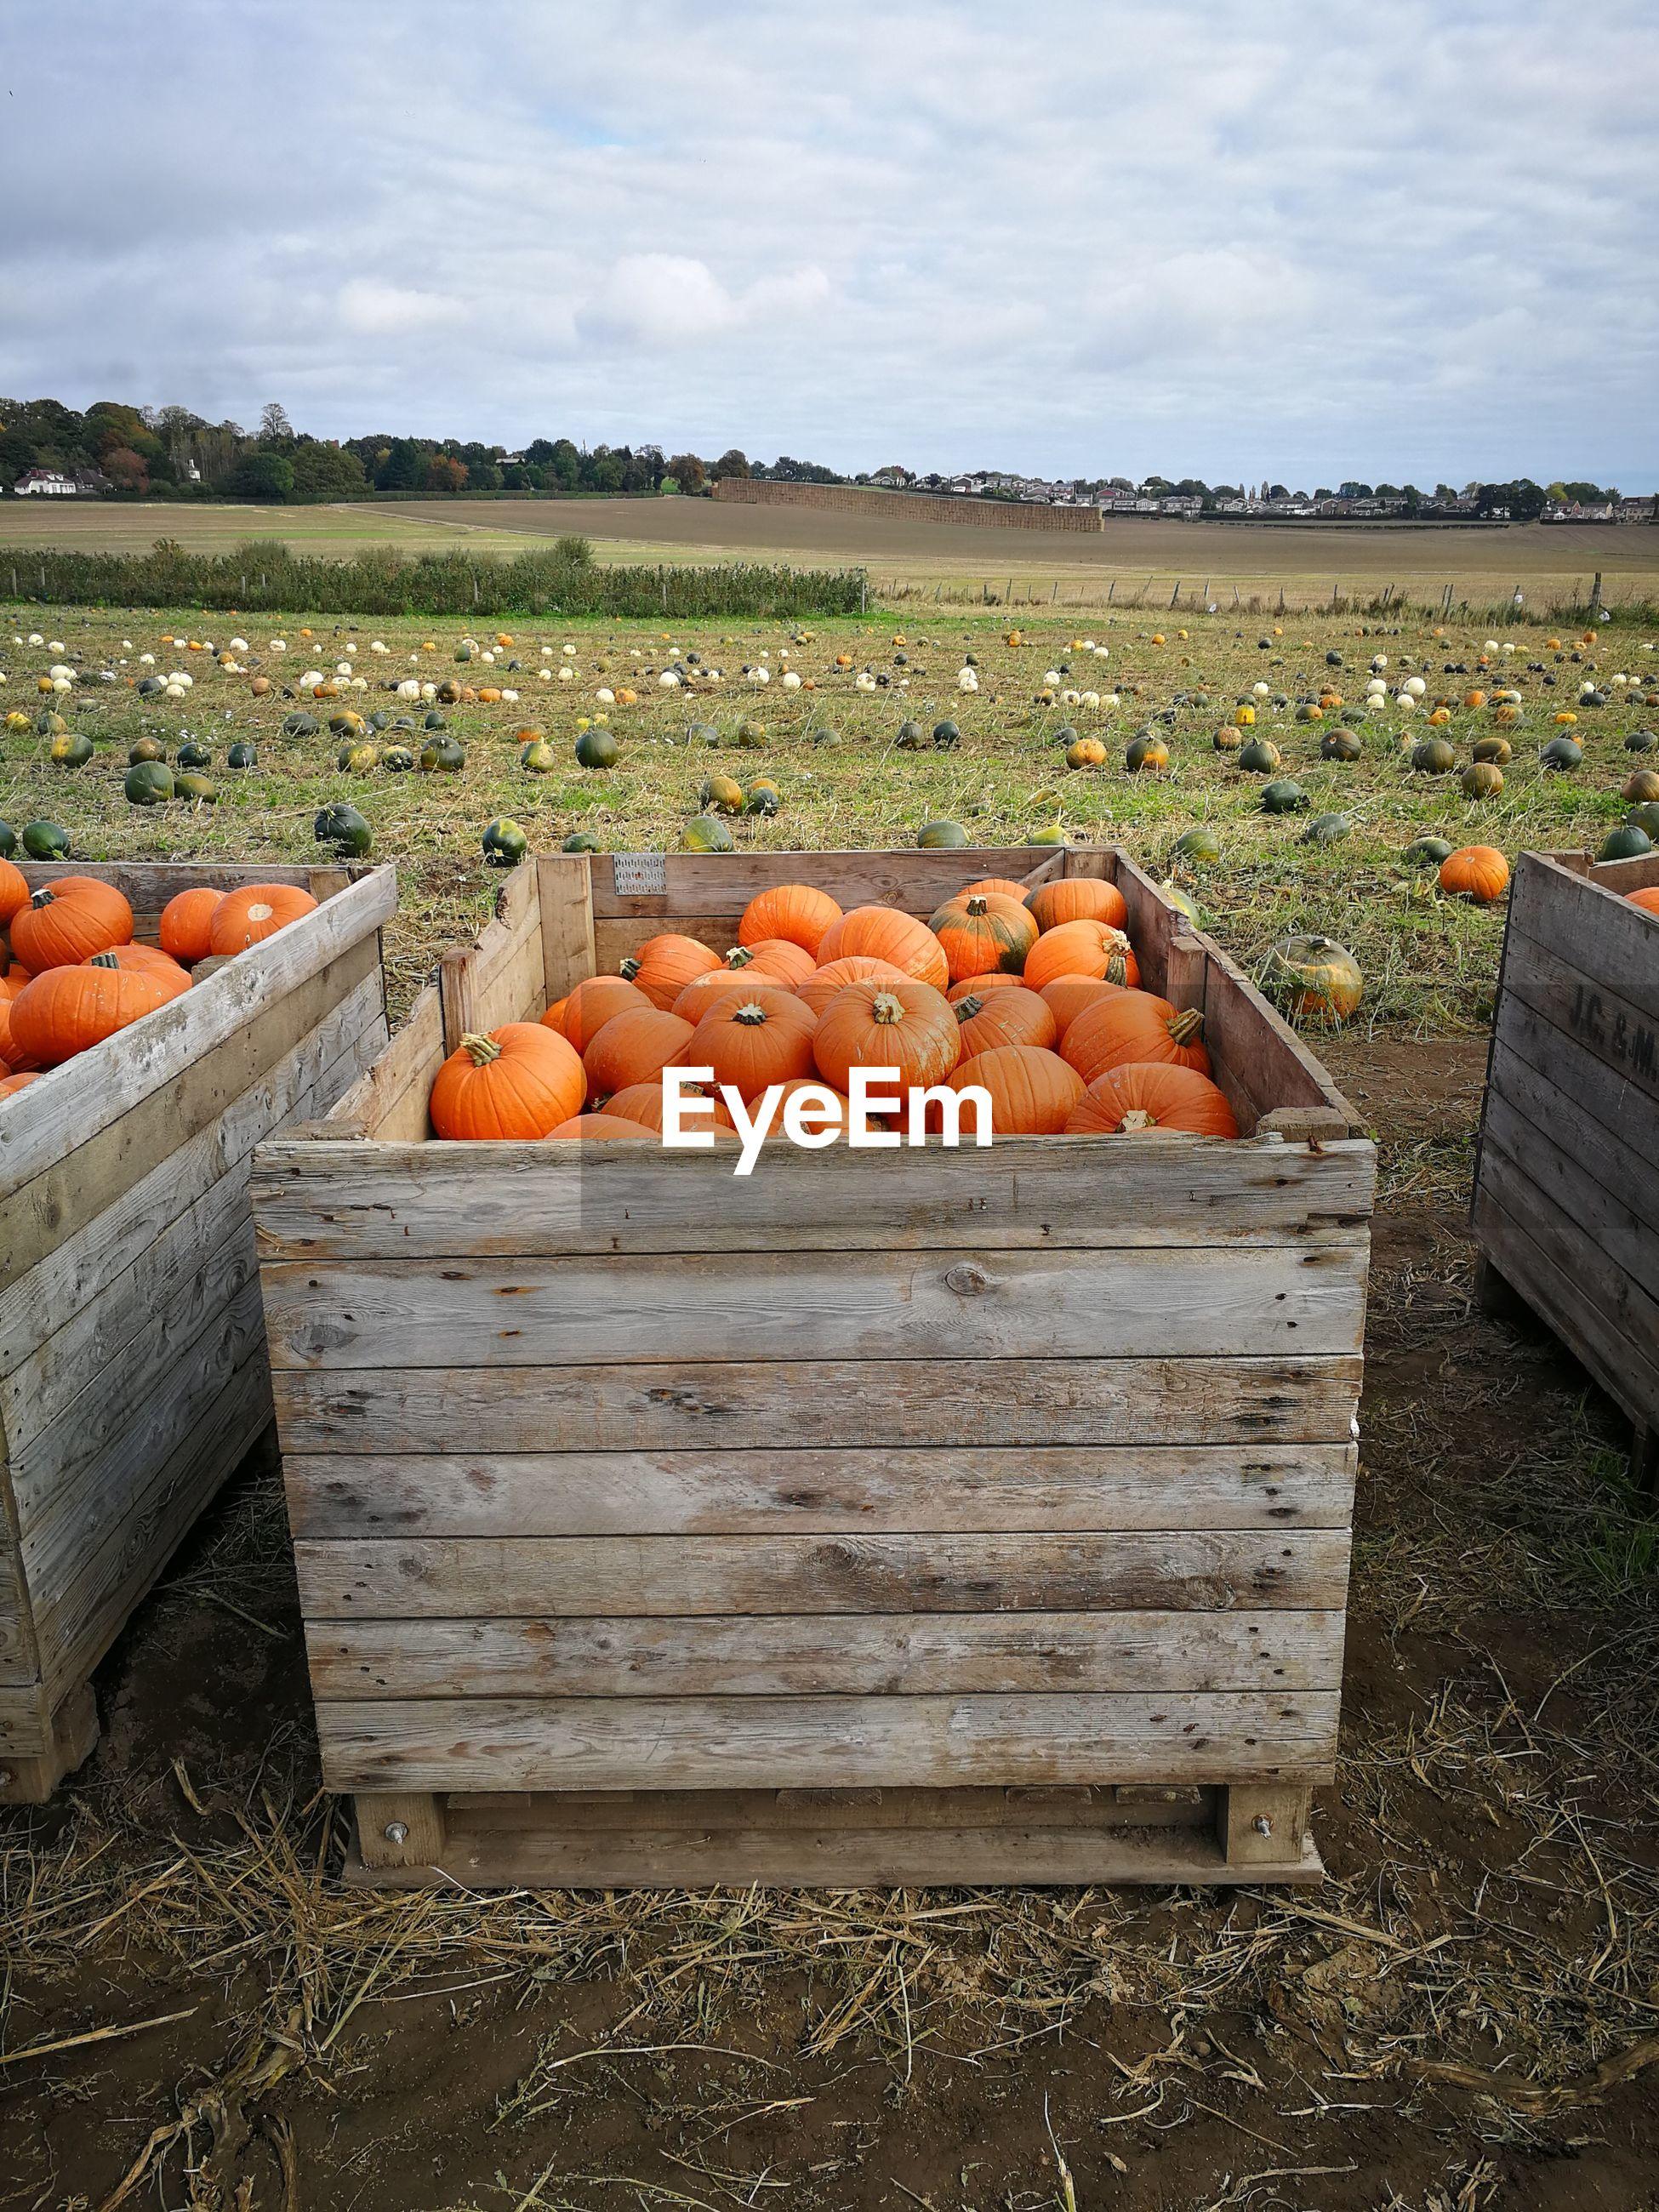 Pumpkins in crate at farm against sky